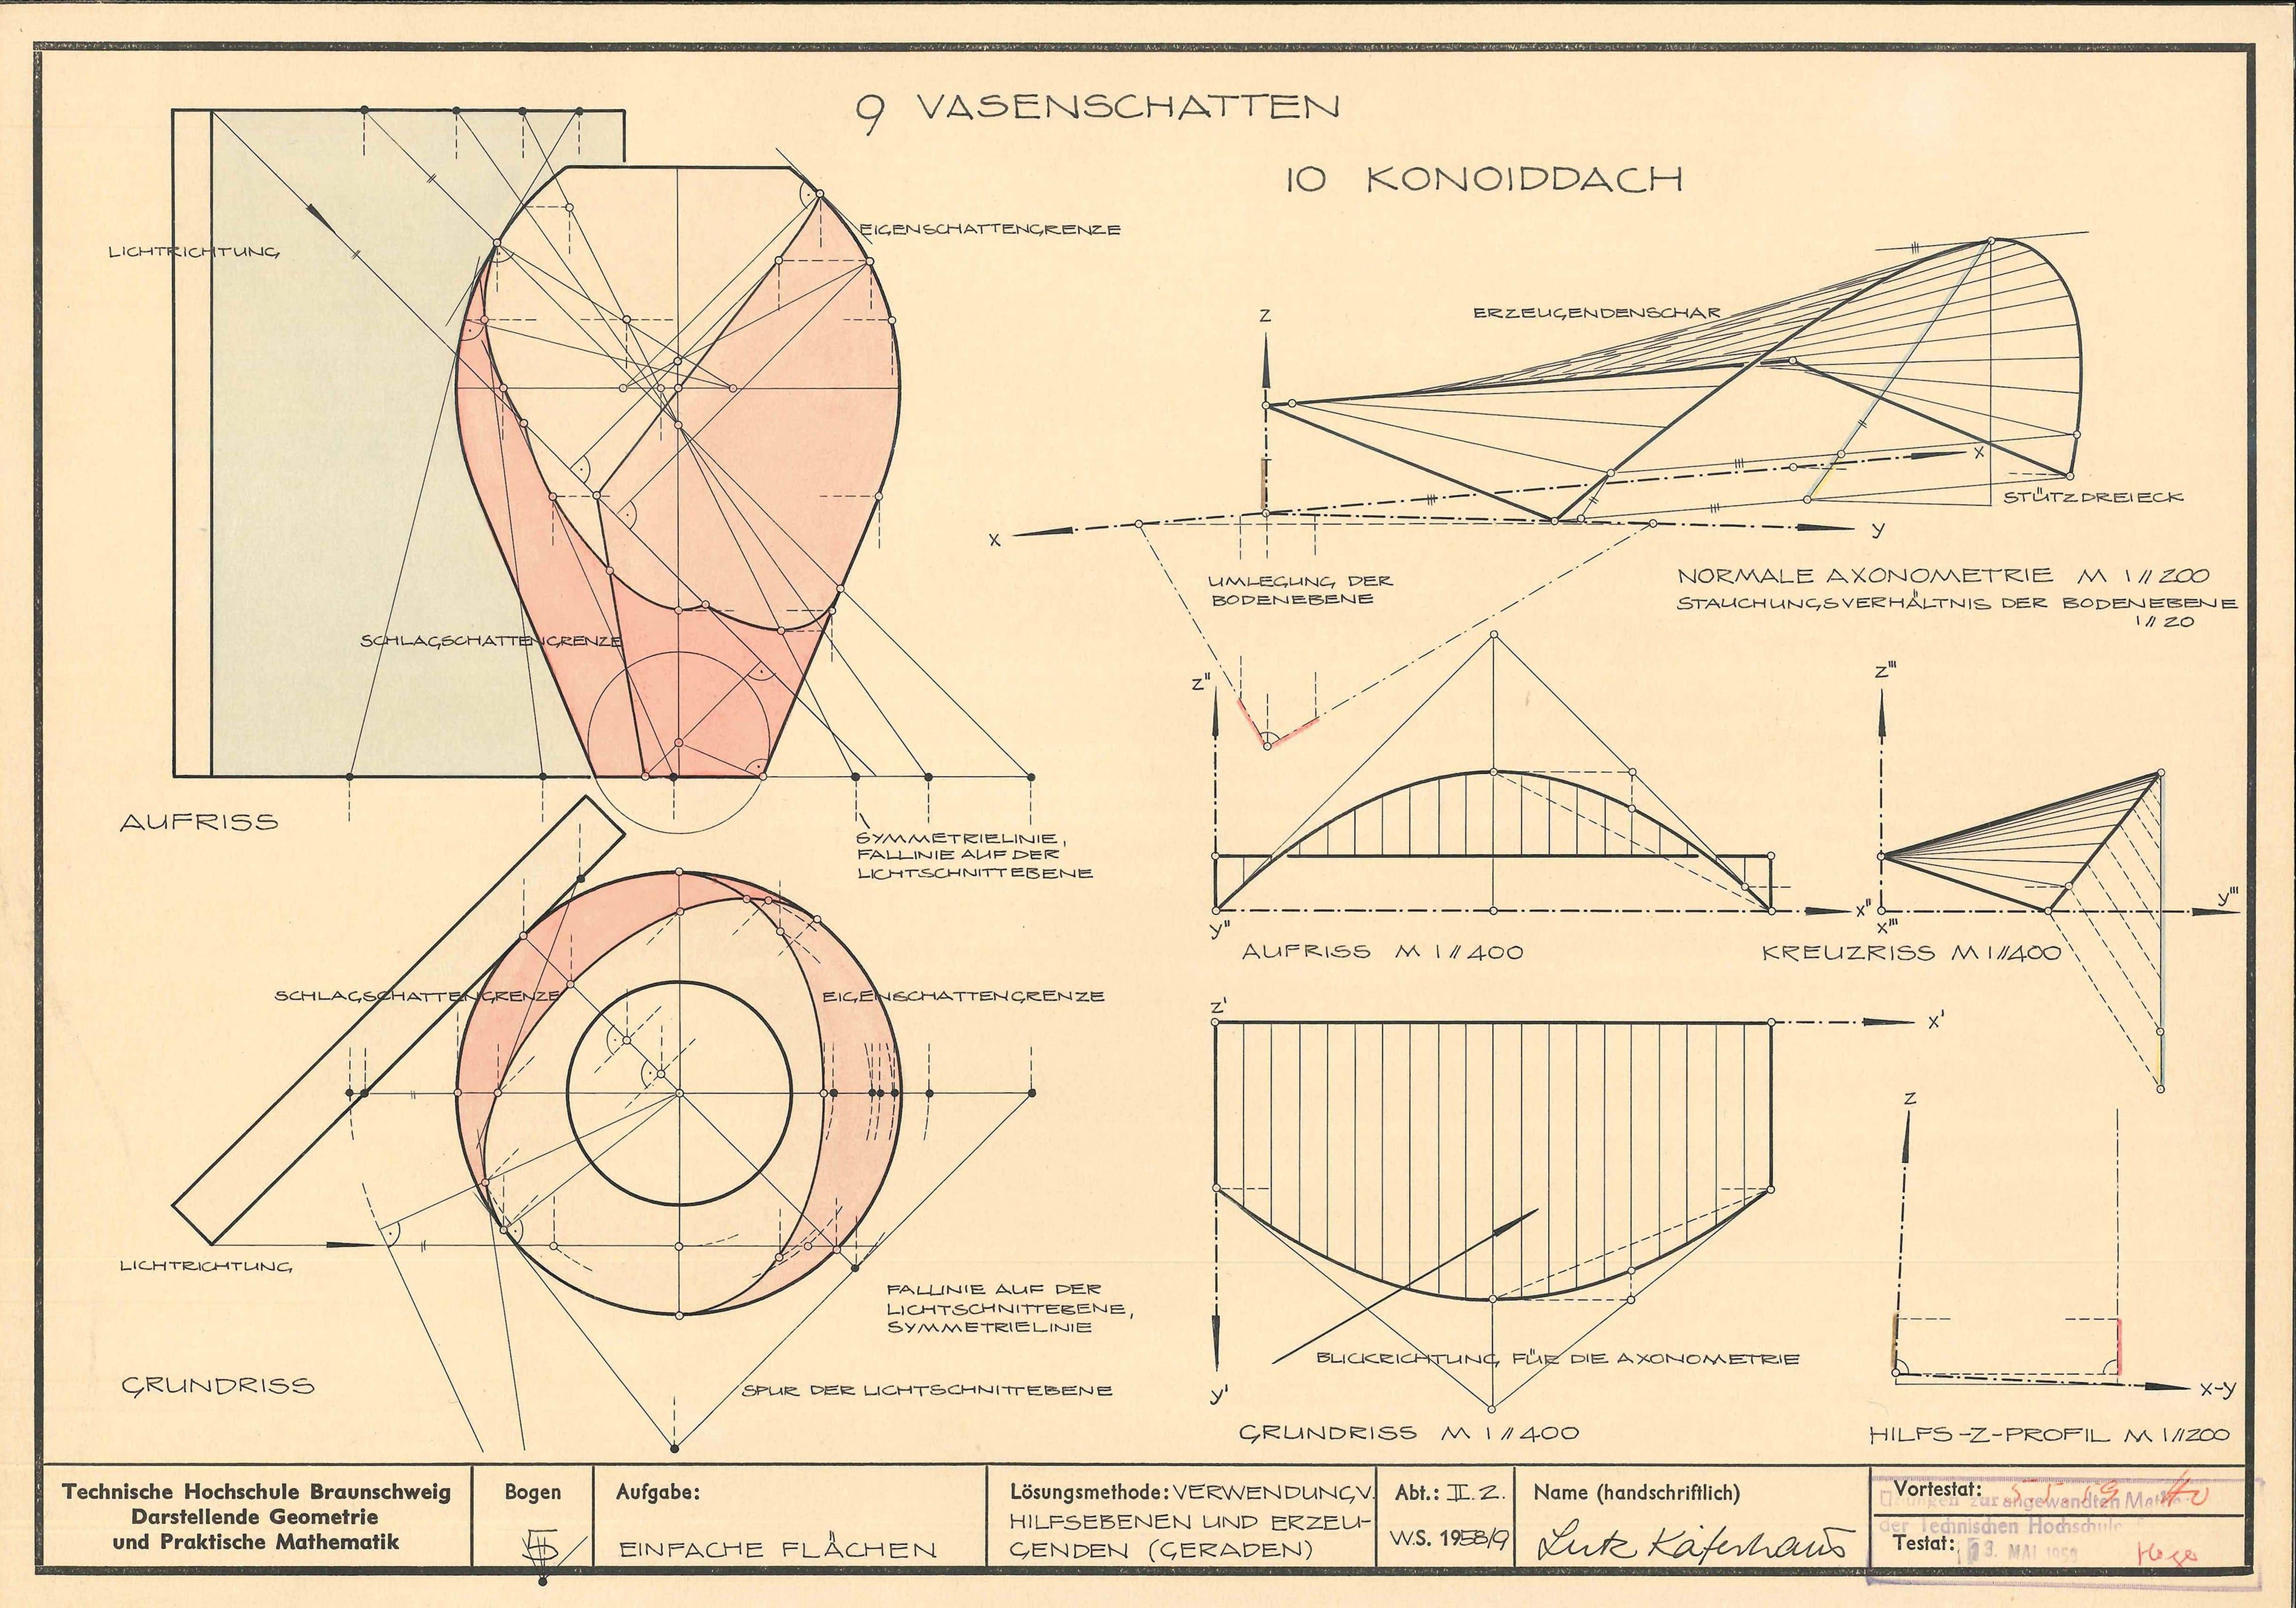 Kaeferhaus Lutz Darstellende Geometrie 1959